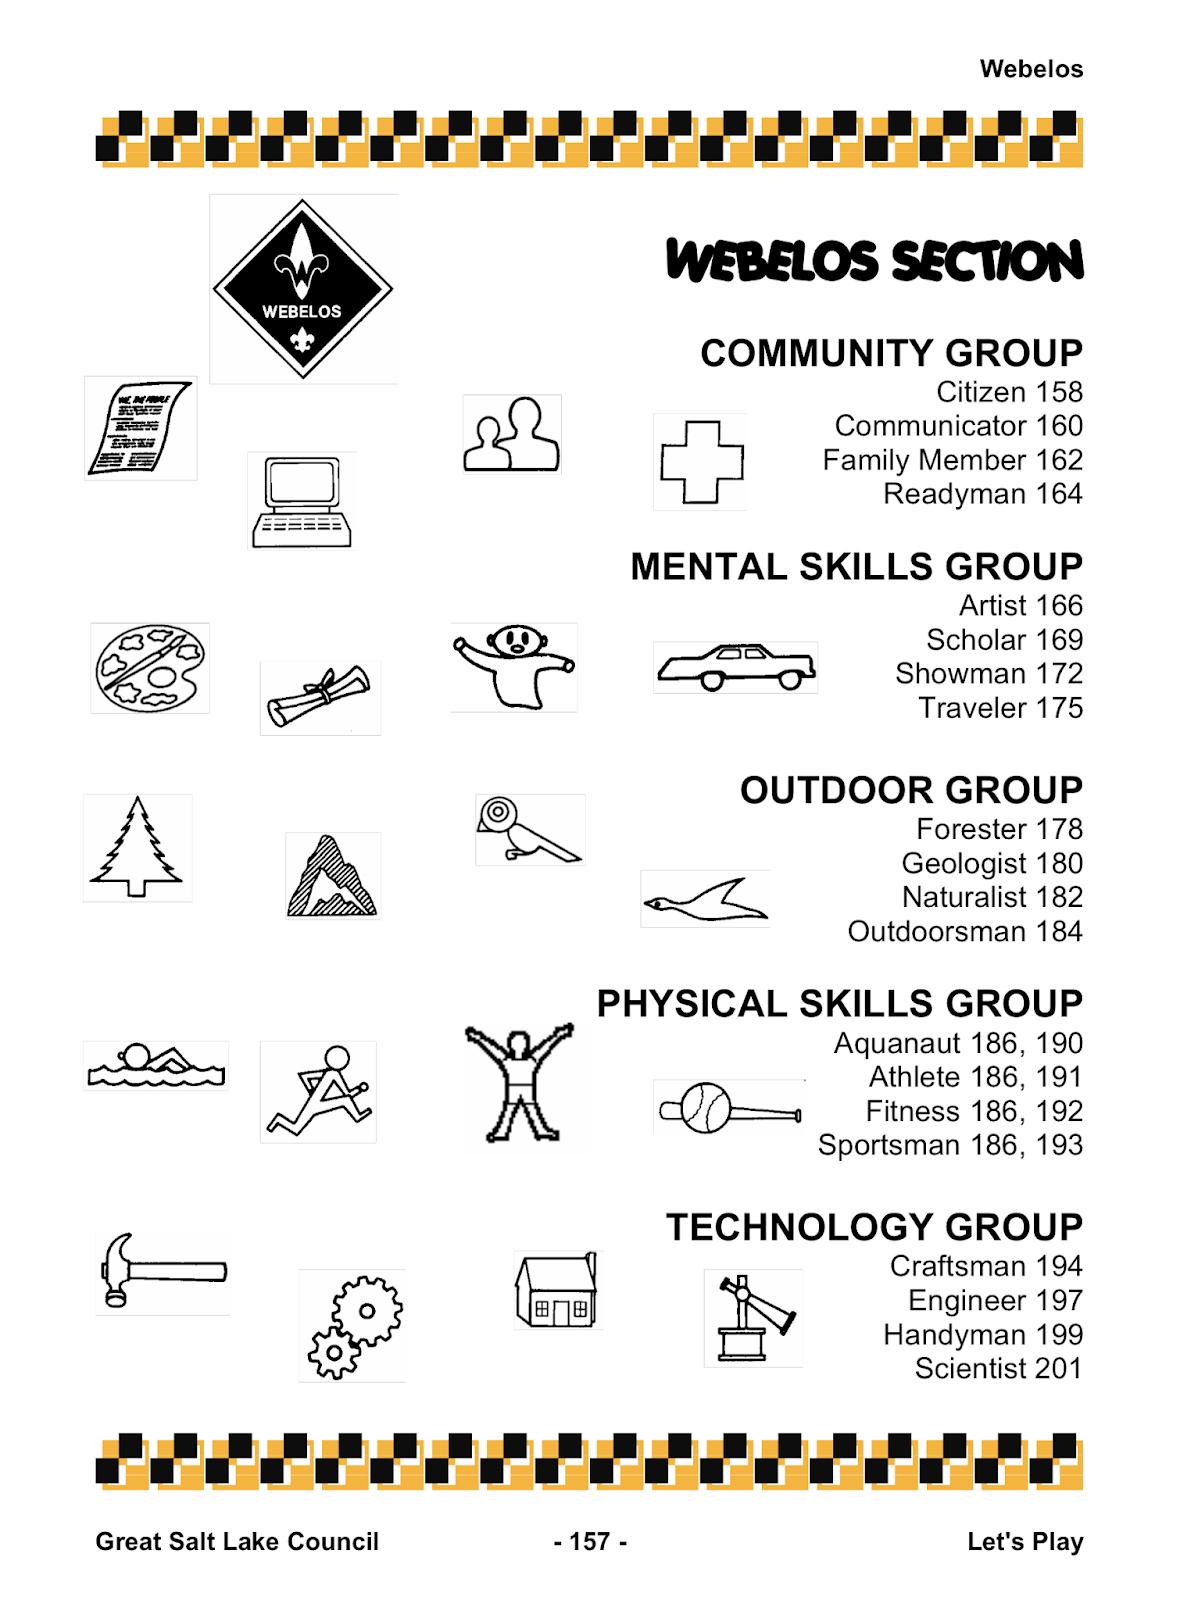 Akela S Council Cub Scout Leader Training Webelos Section